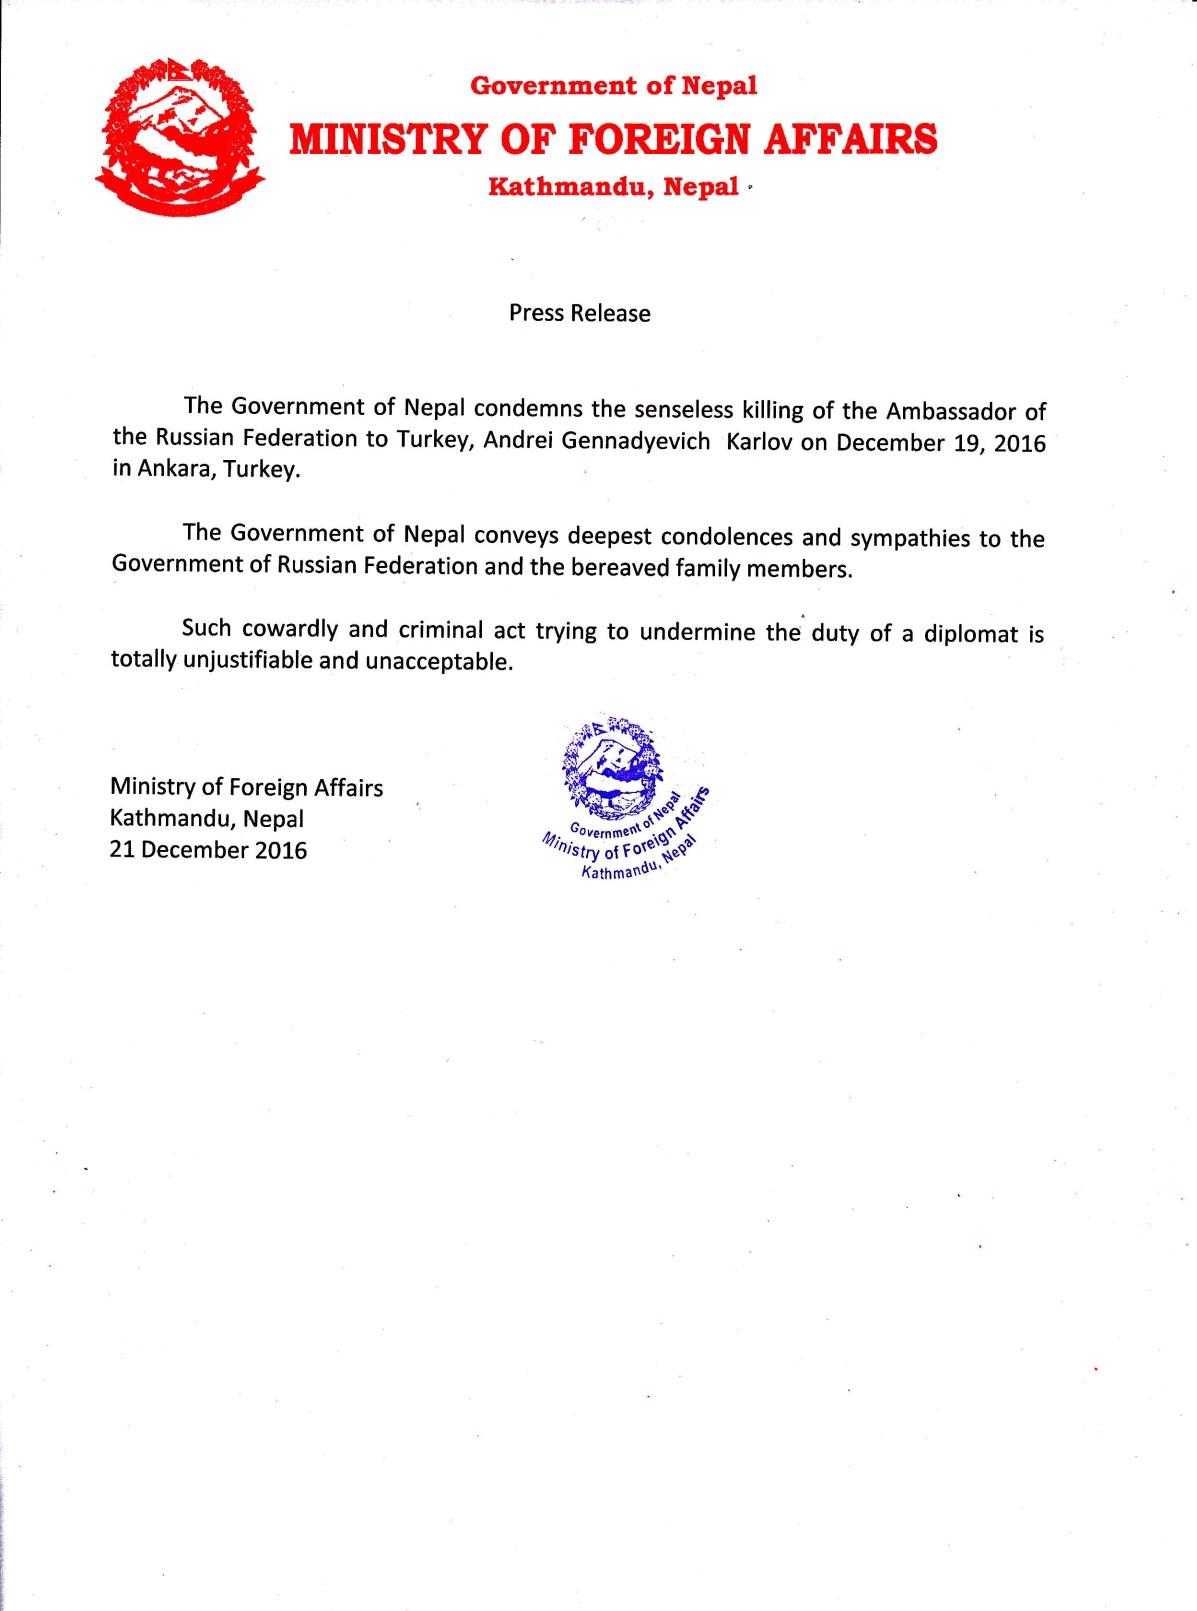 press-release-on-killing-of-russian-ambassador